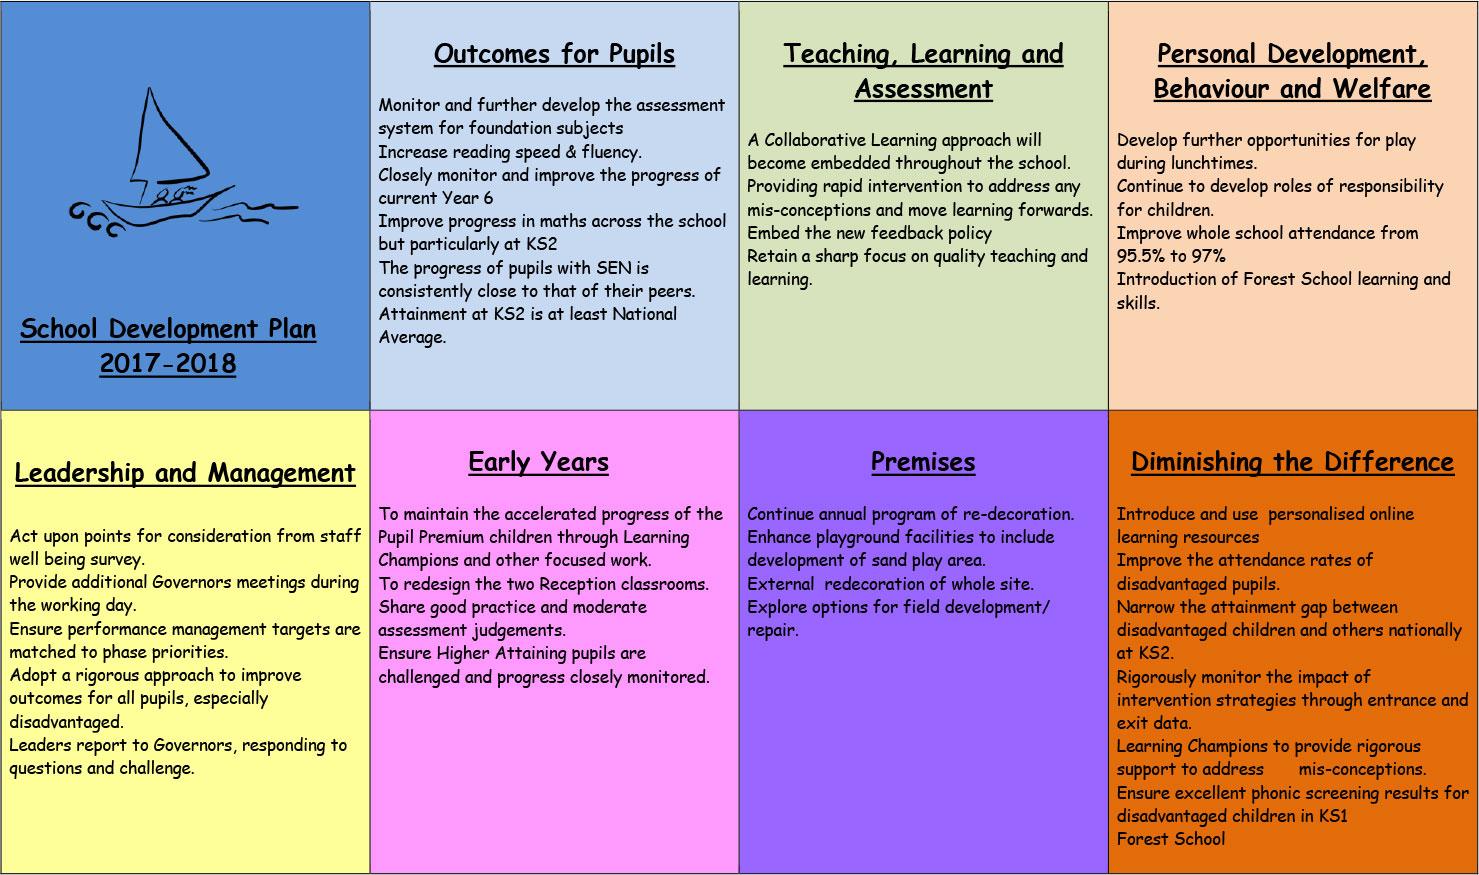 school-development-plan-summary